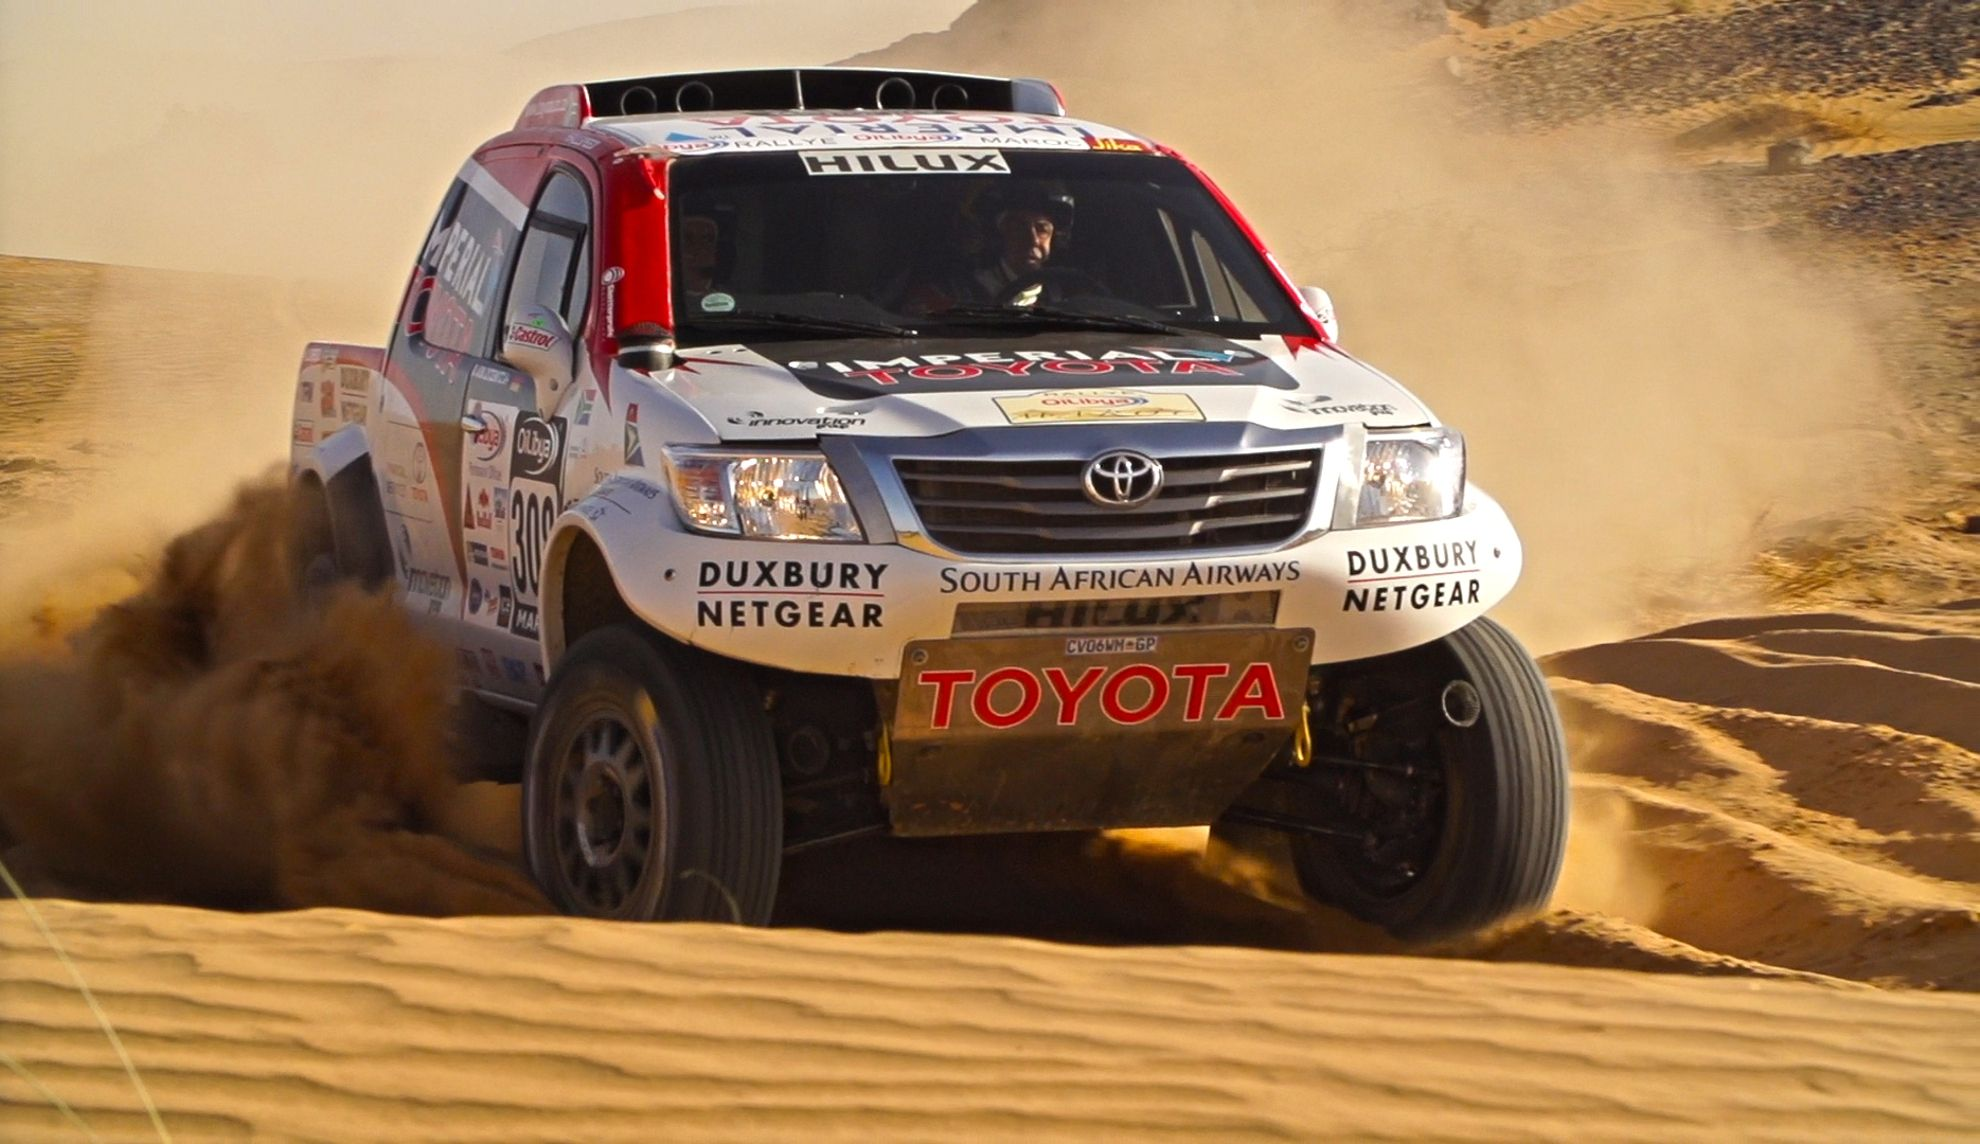 Iveco Dakar 2015 Trucks In South Africa